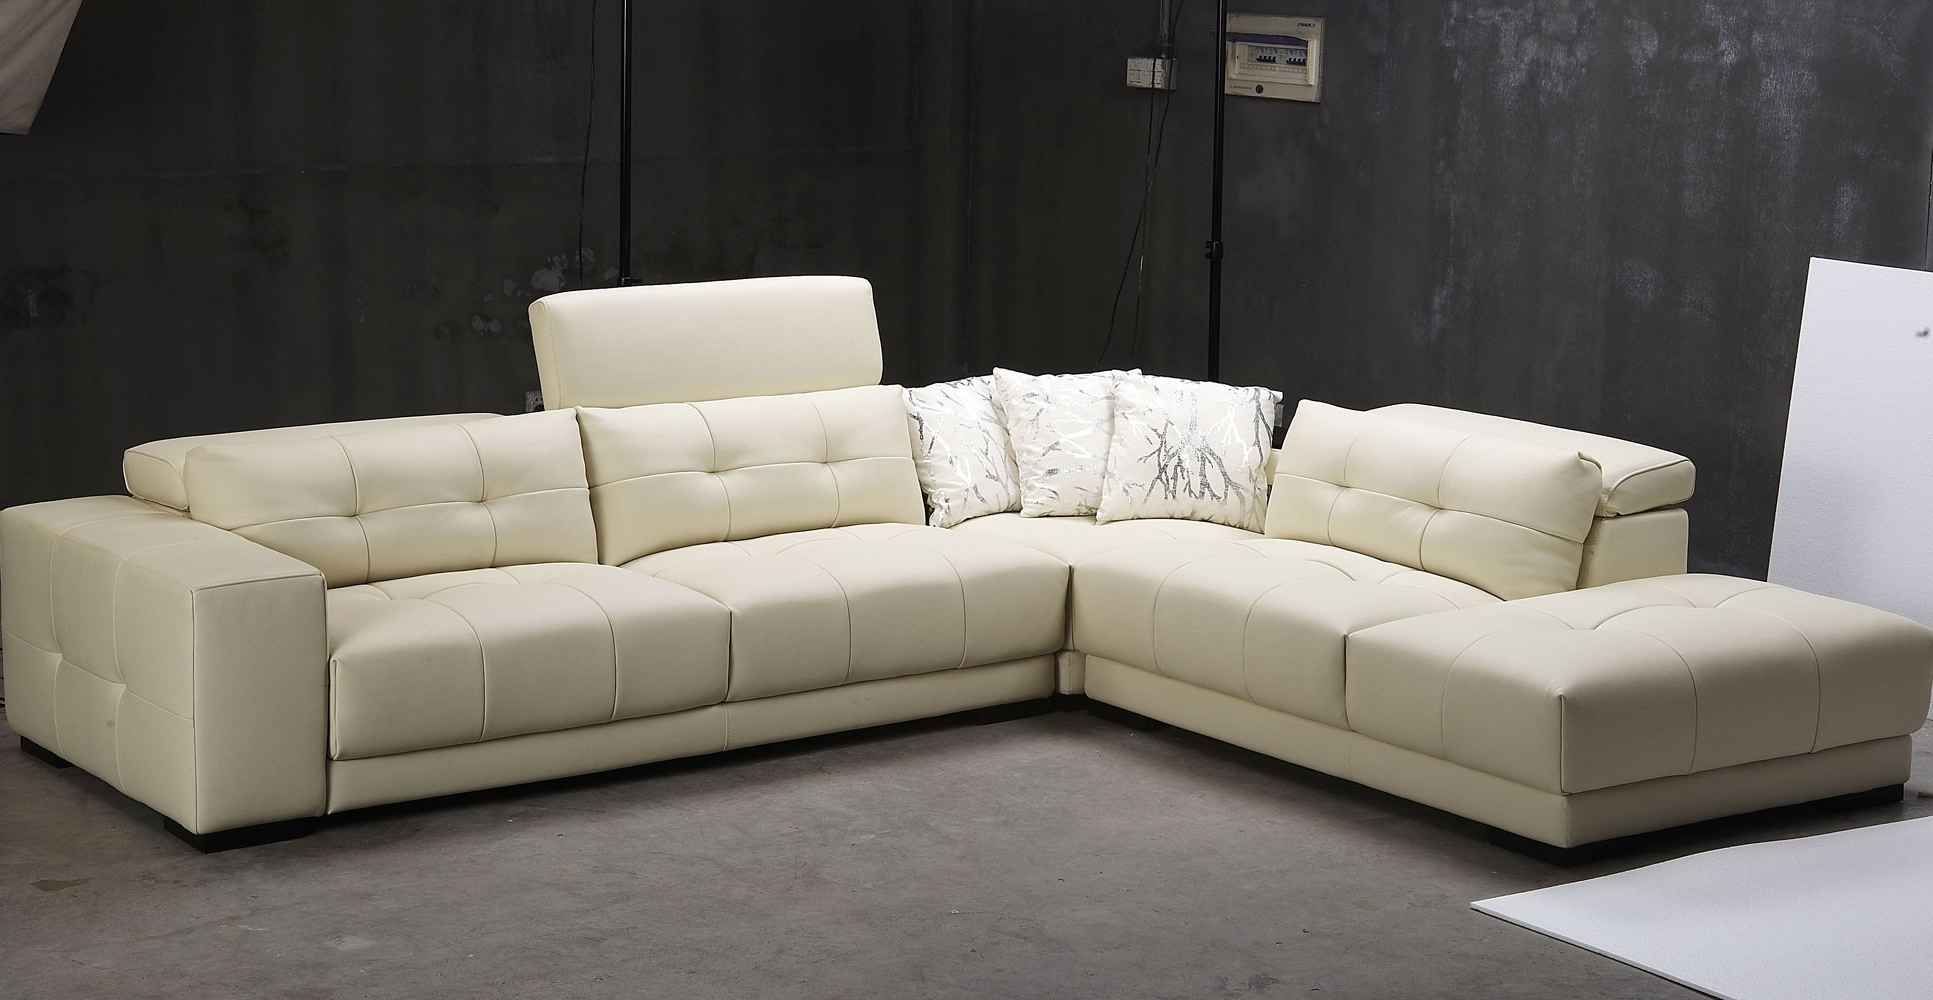 Jedd Fabric Reclining Sectional Sofas Throughout Most Recent Jedd Fabric Reclining Sectional Sofa Reviews Sofas Contemporary (View 7 of 20)